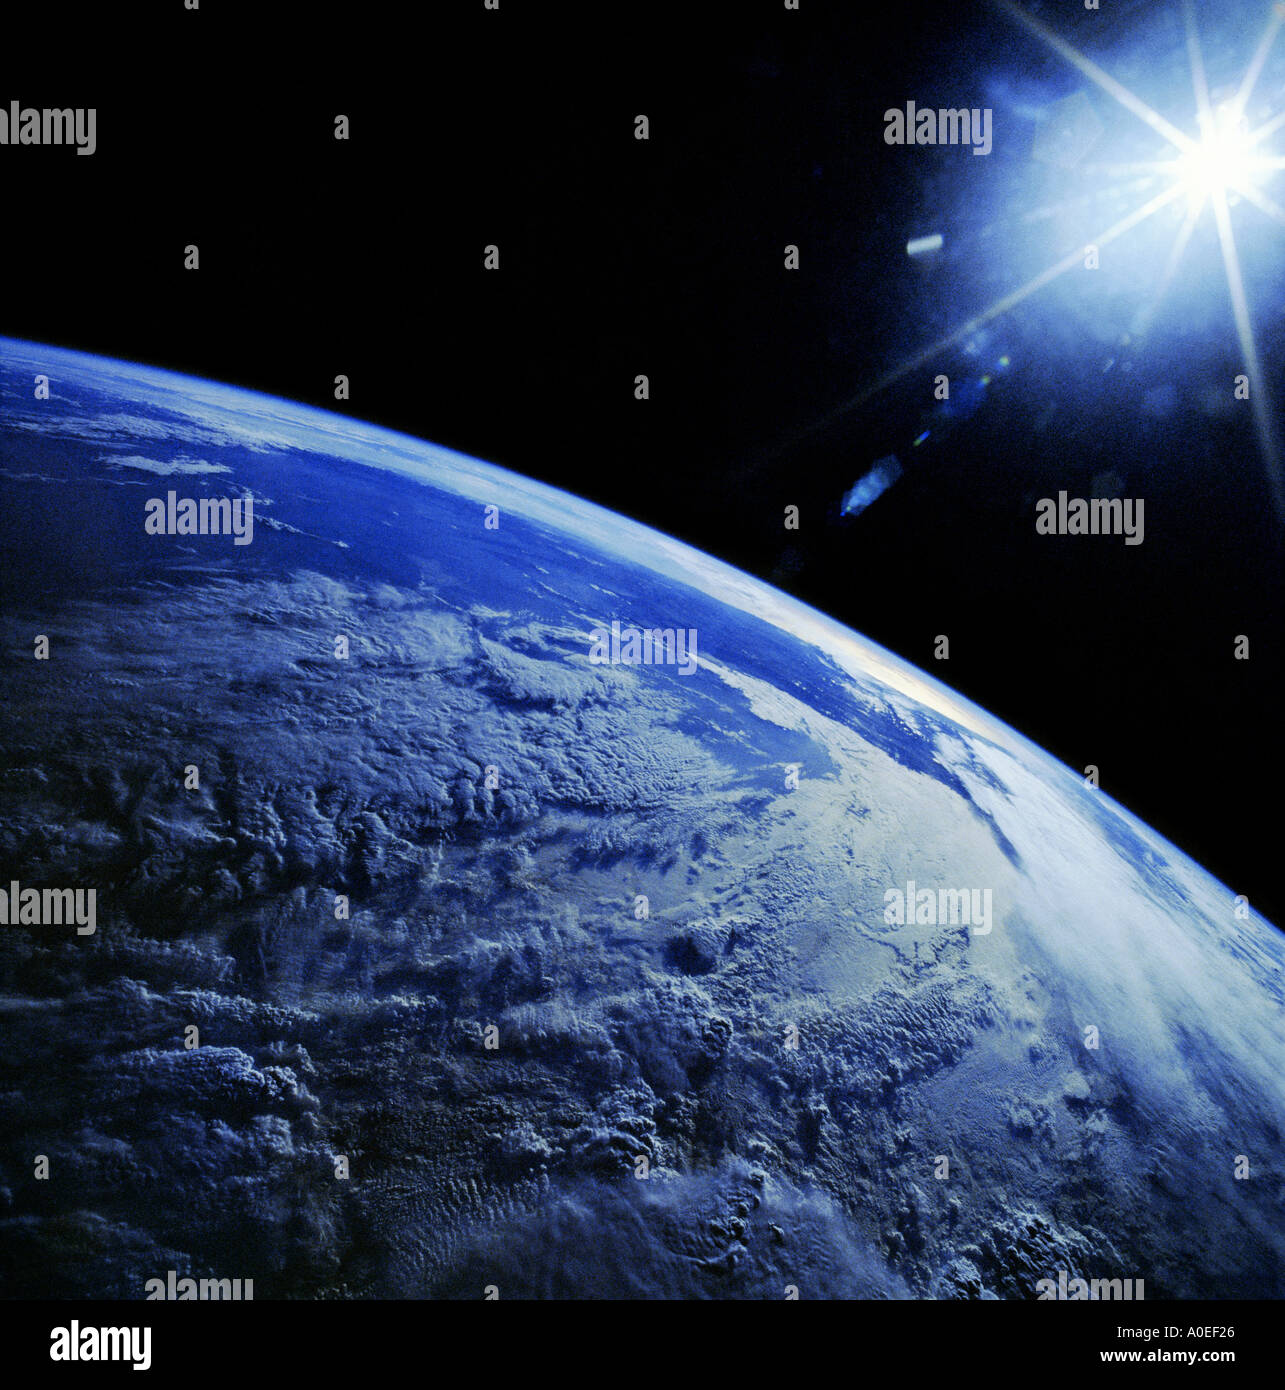 La terre de l'espace Photo Stock